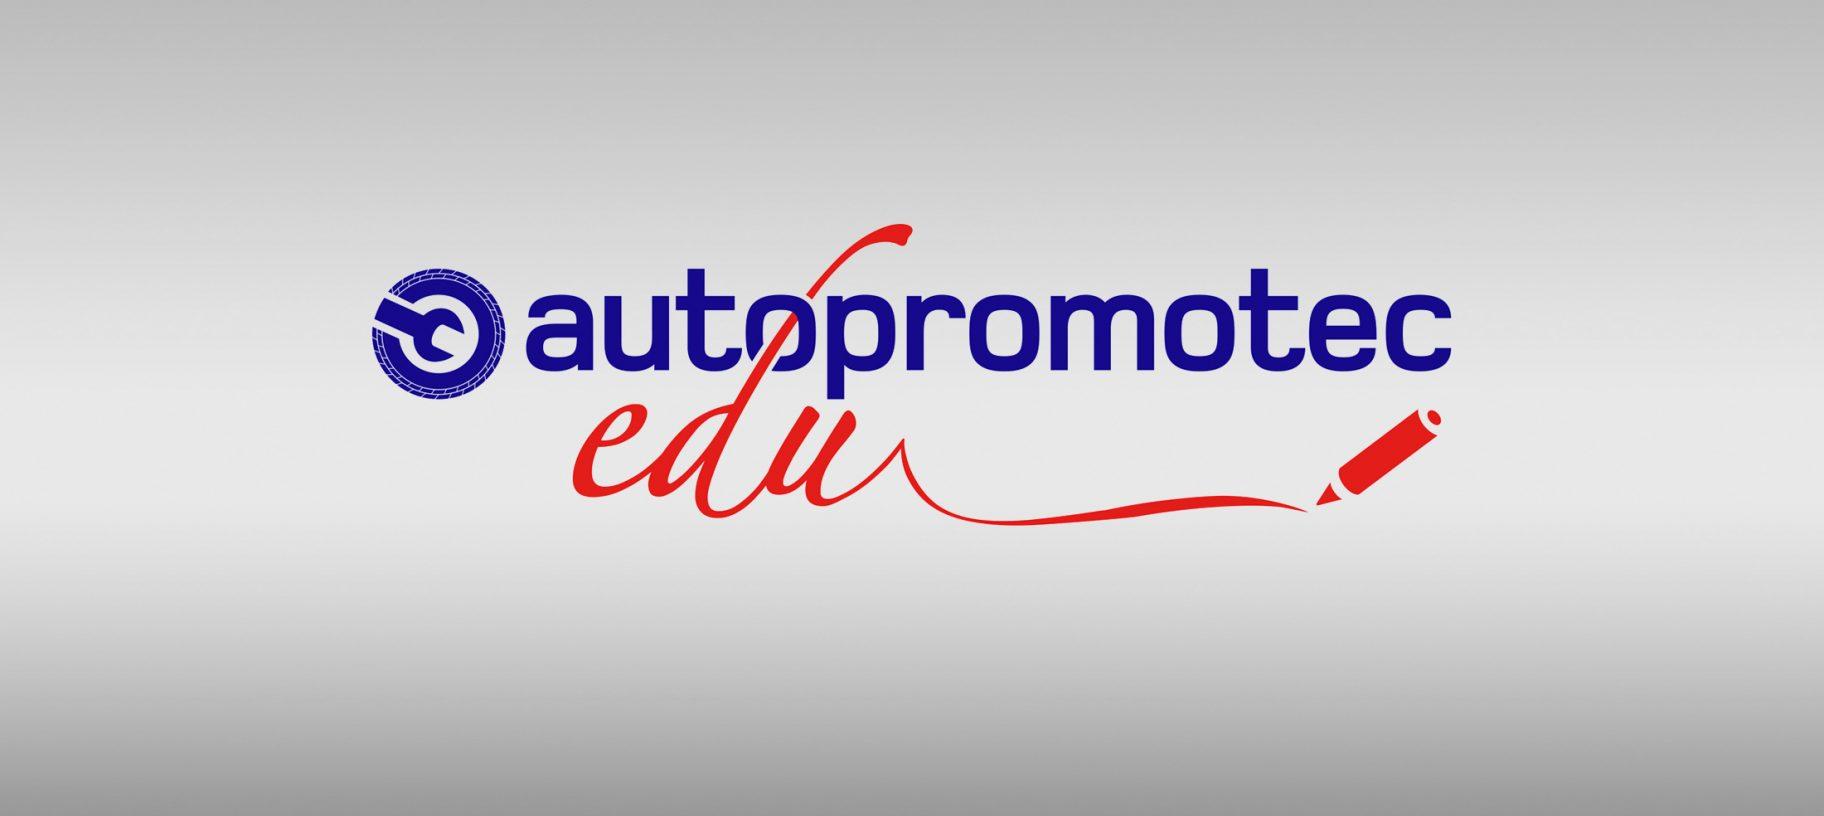 Autopromotec-edu-logo-fiera